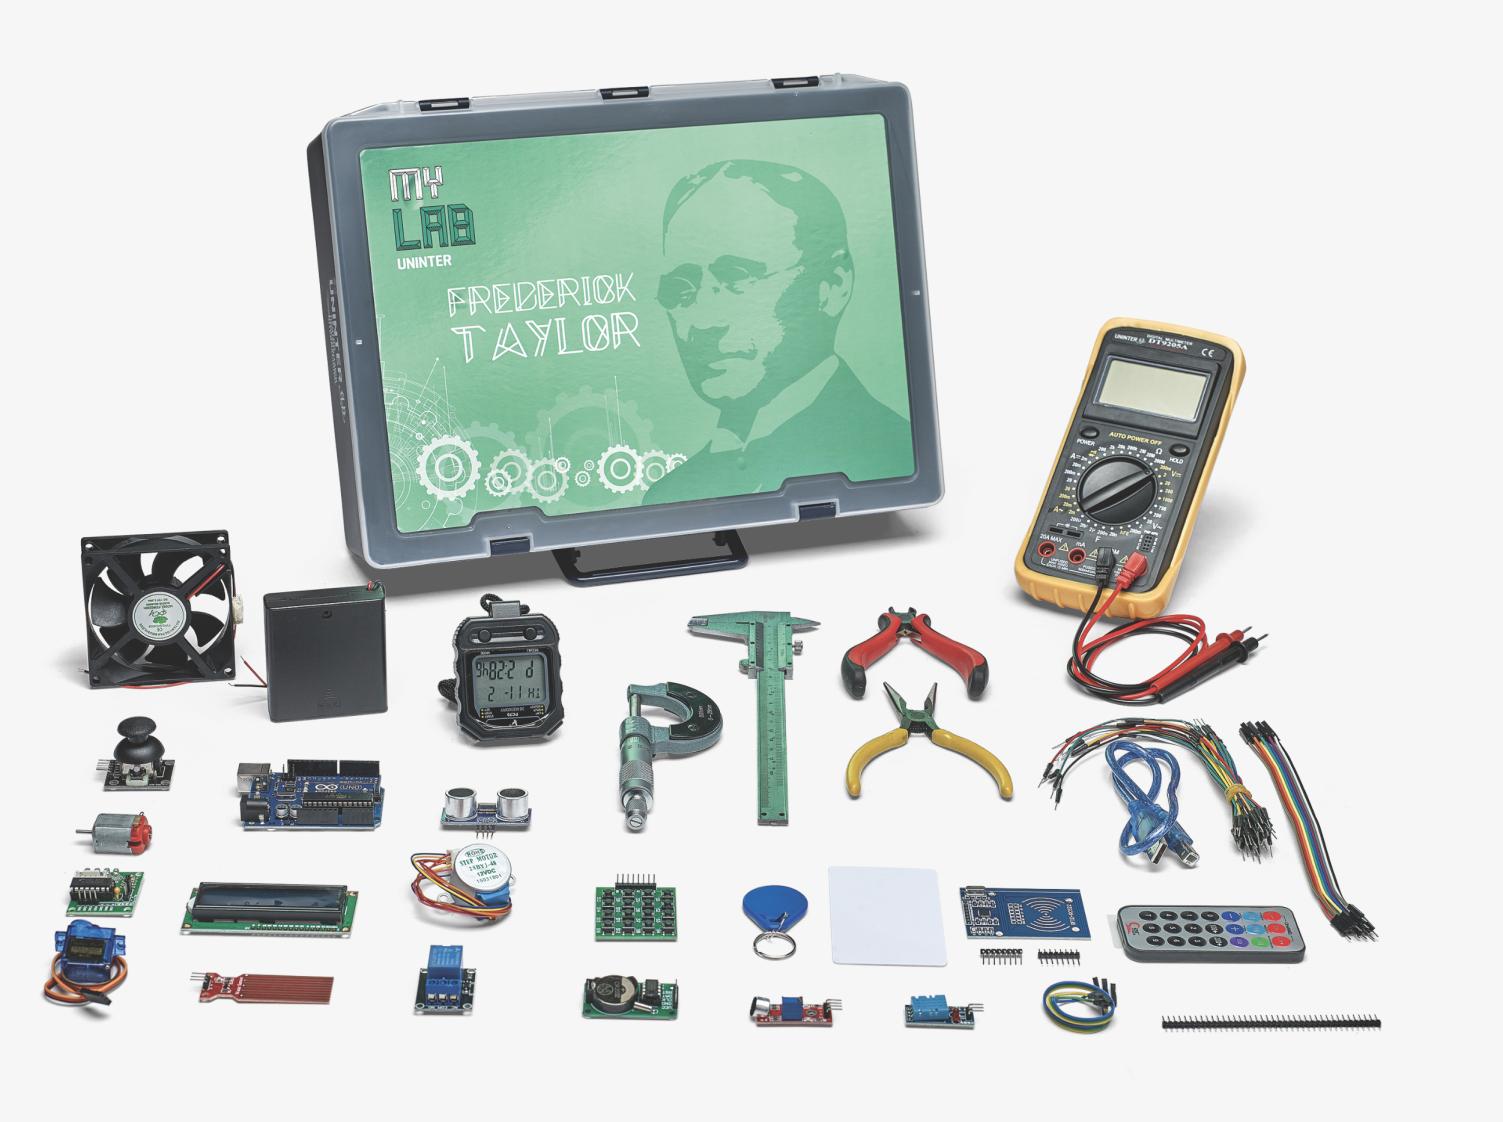 lab-taylor